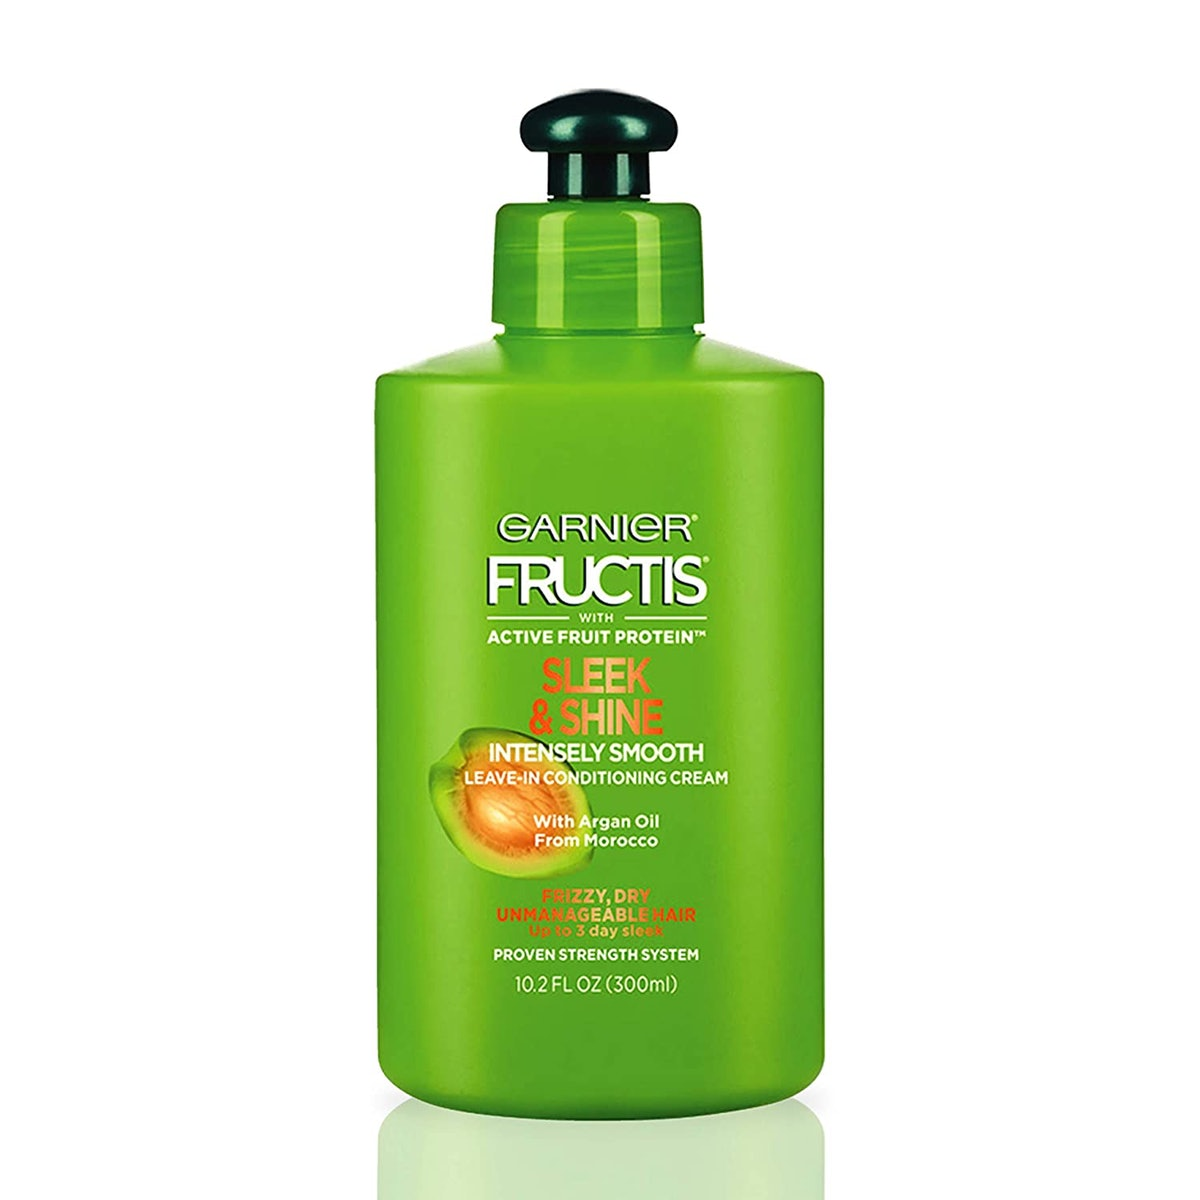 Garnier Fructis Sleek & Shine Intensely Smooth Leave-In Conditioner Cream